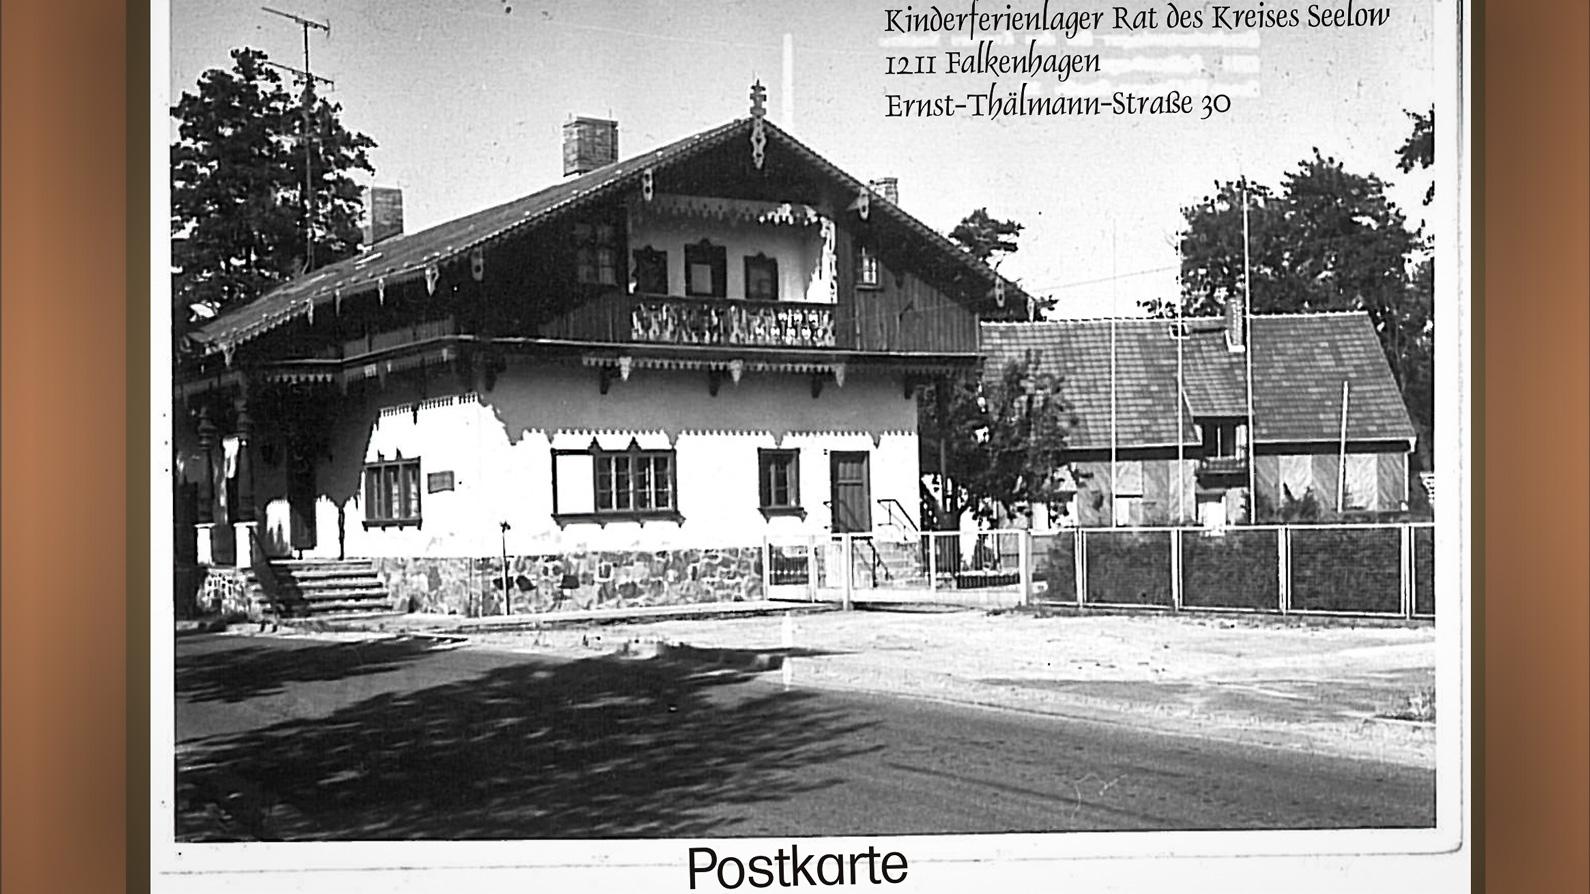 Postkarte-Kinderferienlager-Rat-des-Kreises-1